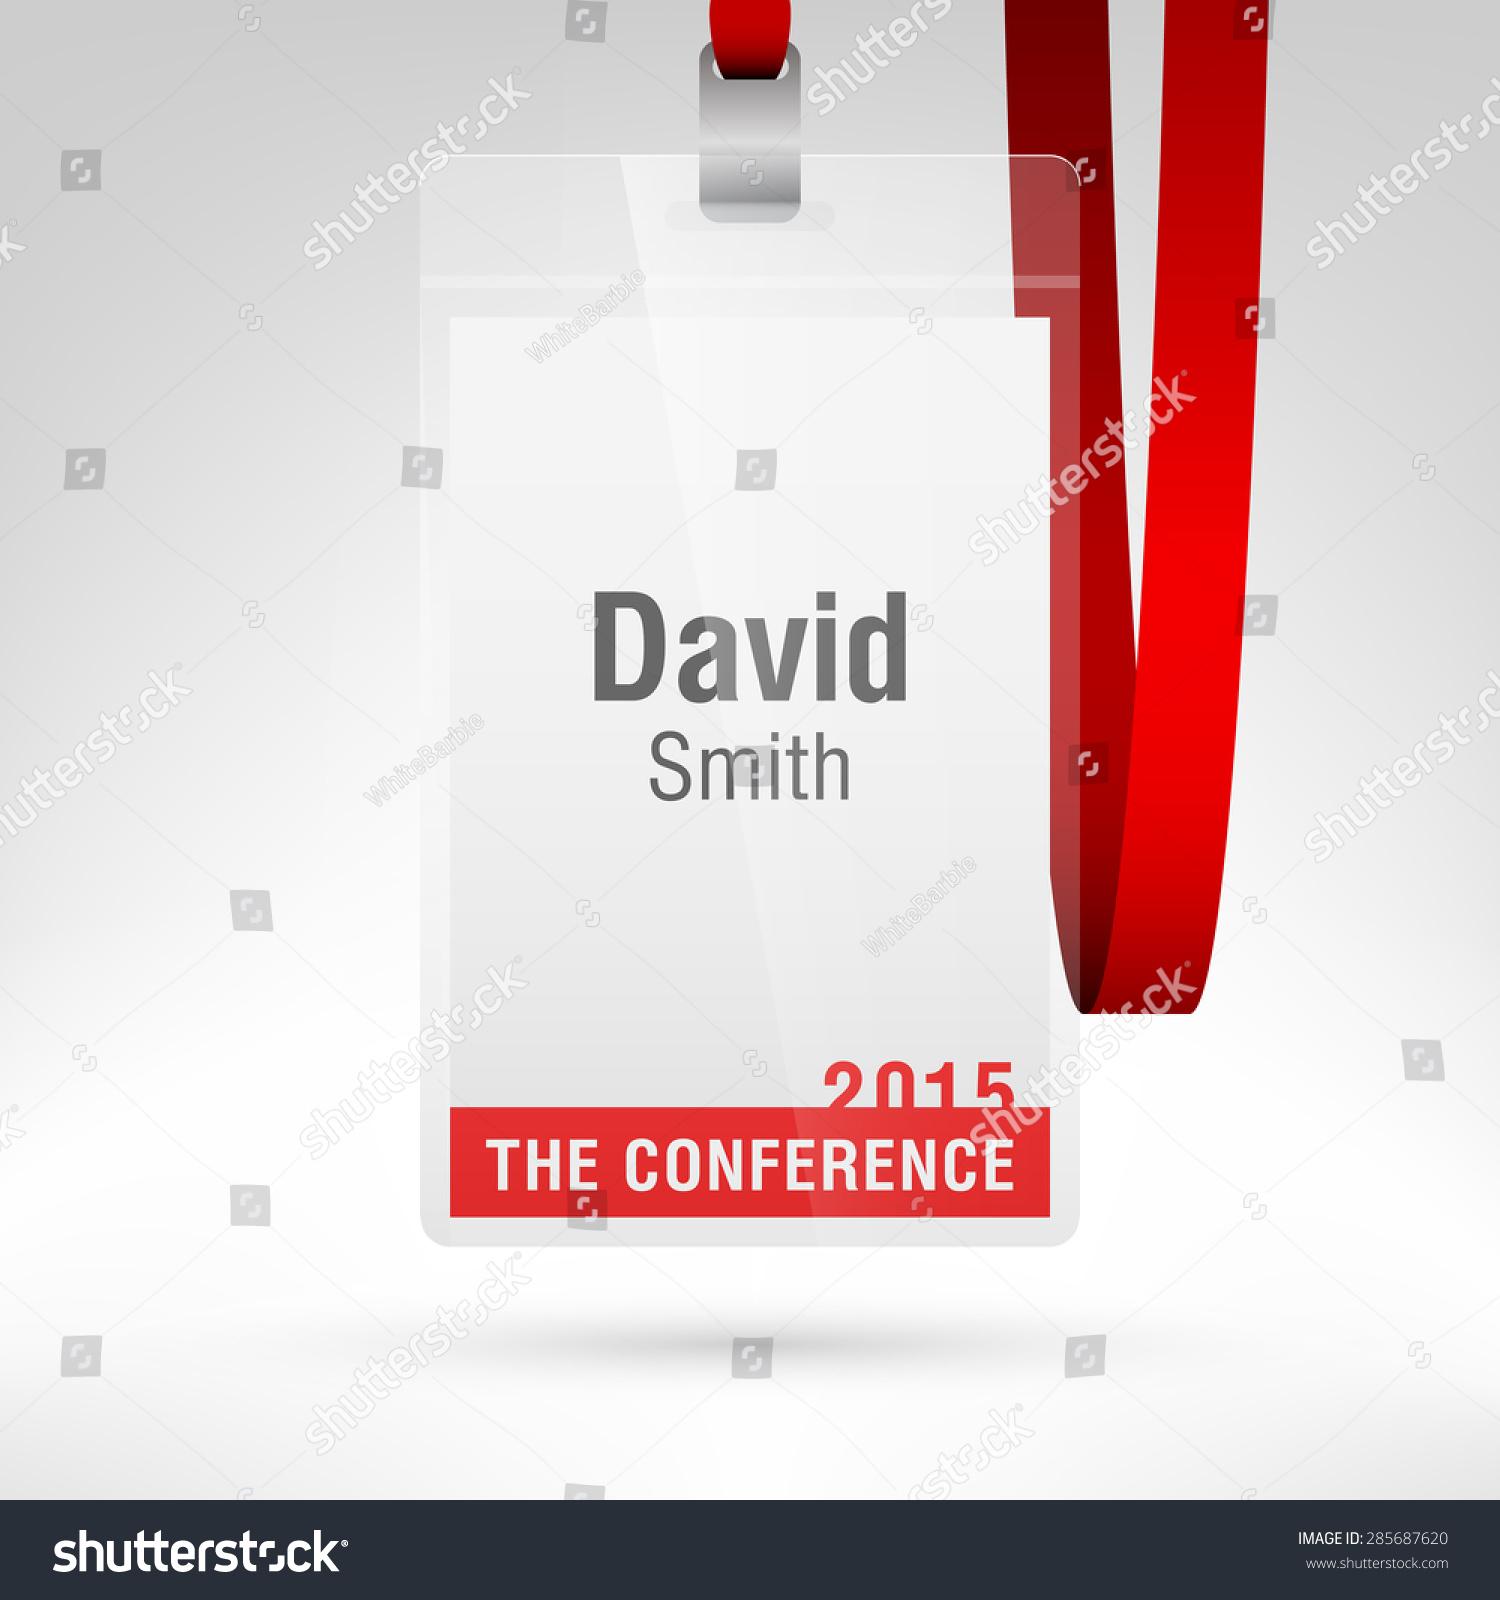 conference badge name tag placeholder blank stock vector 285687620 shutterstock. Black Bedroom Furniture Sets. Home Design Ideas